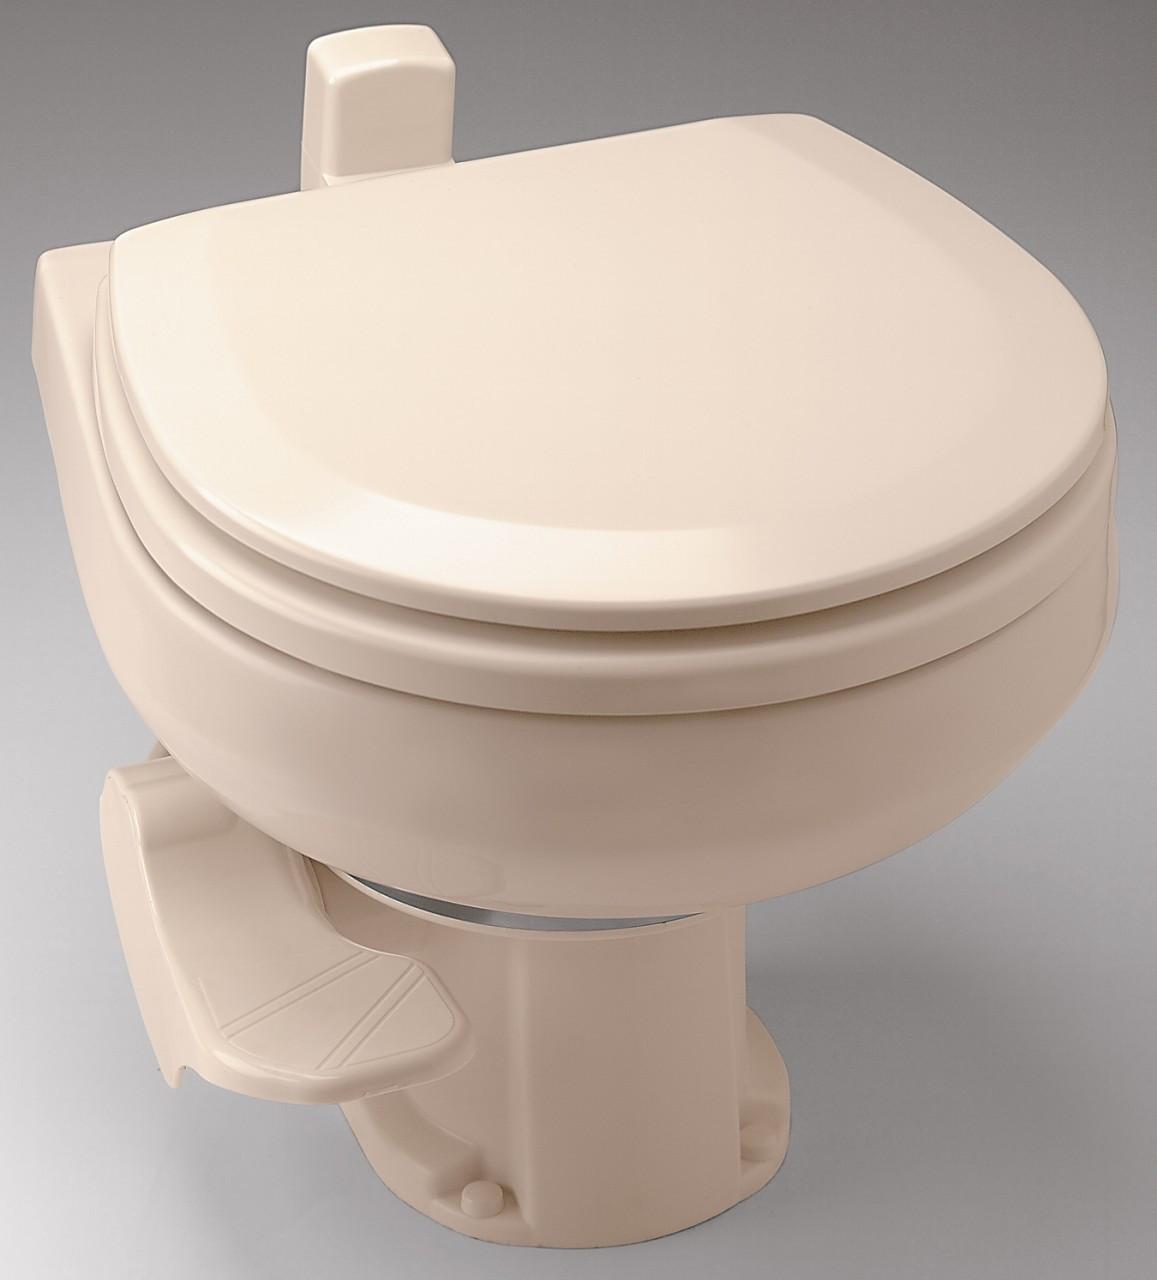 Sealand Dometic 146 Vacuflush Toilet White Ardemco